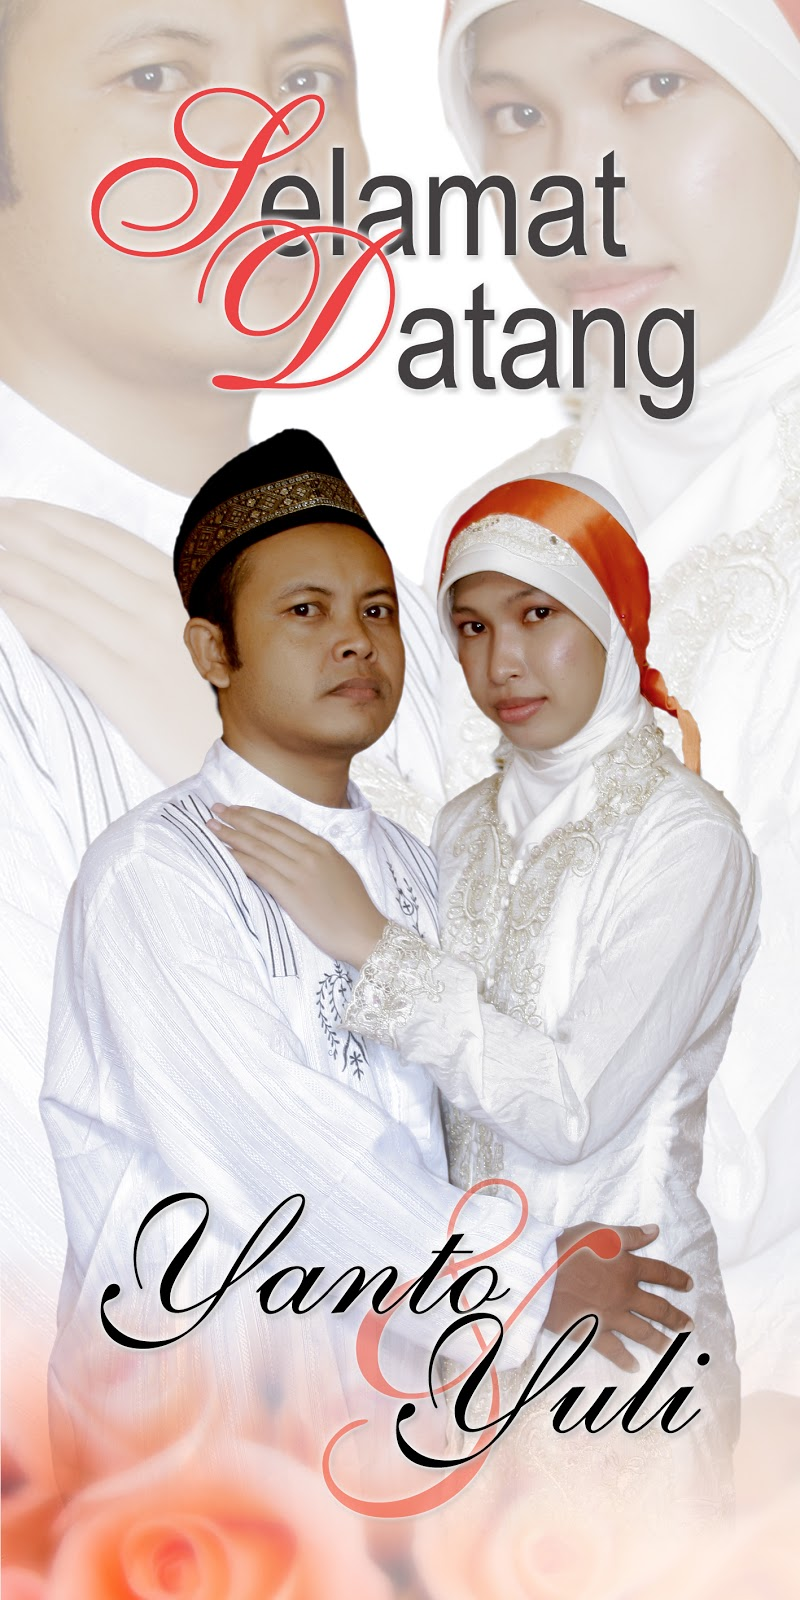 Design x banner pernikahan - Video Project